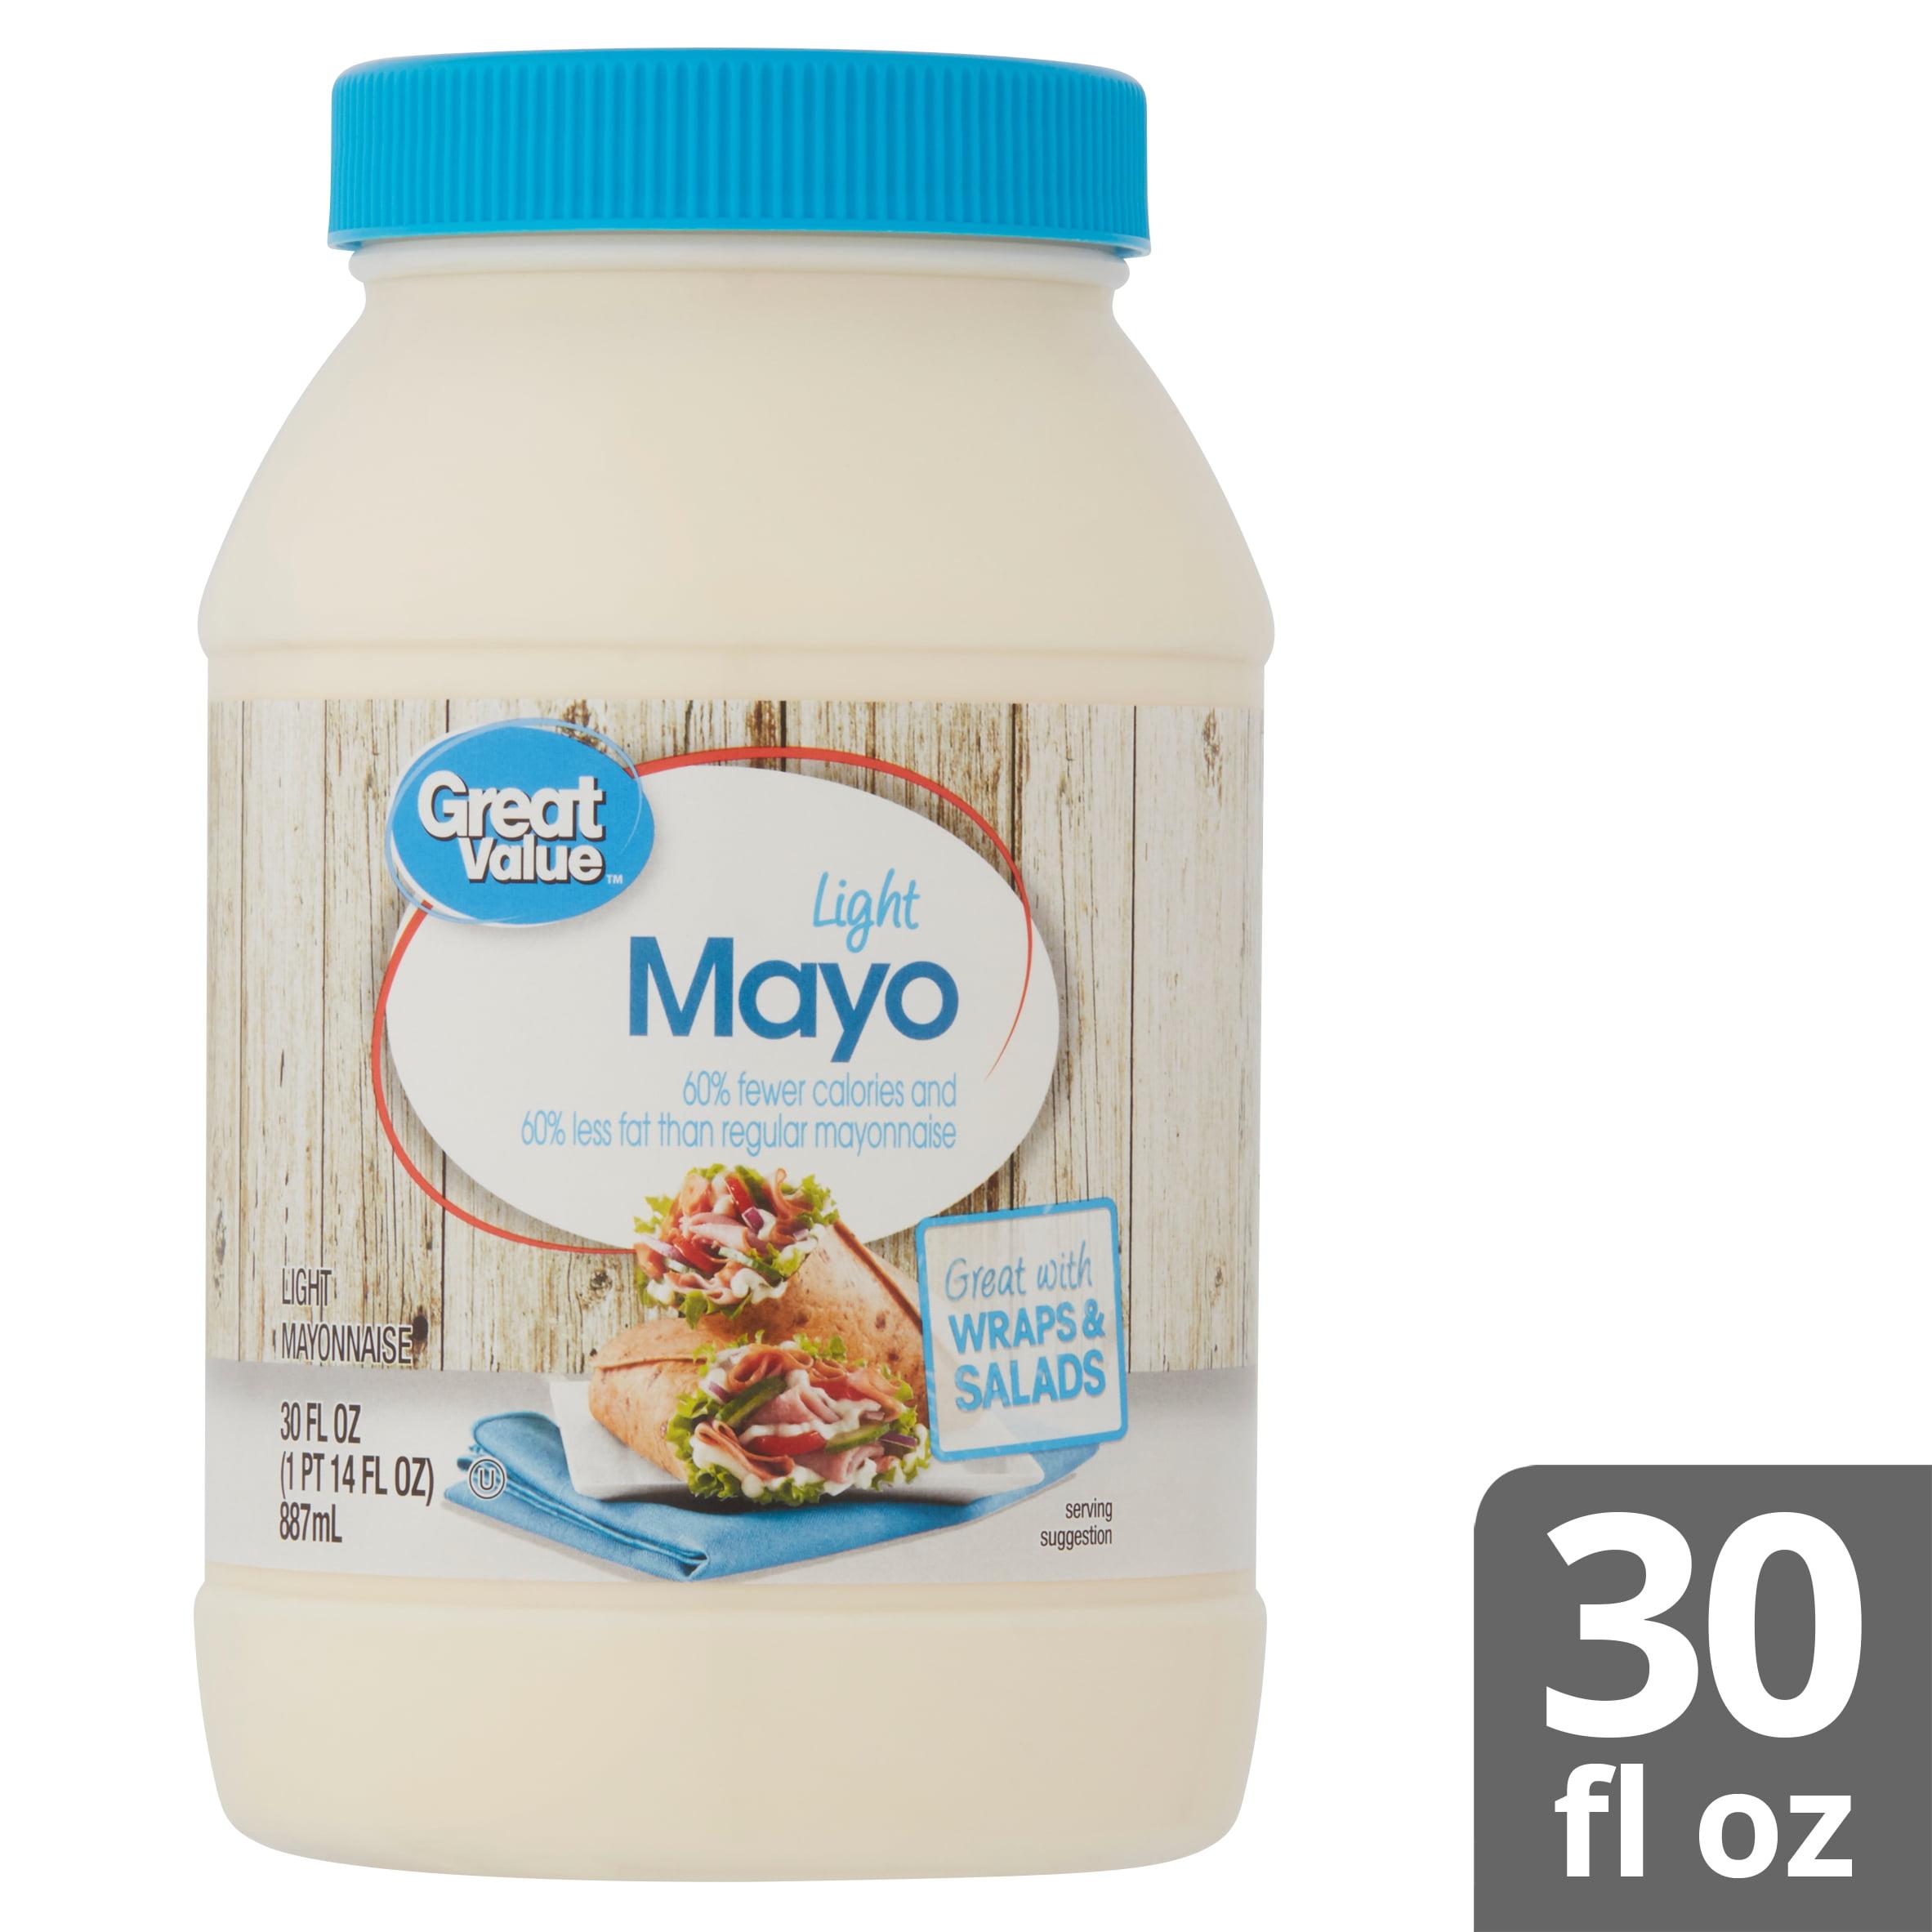 Great Value Light Mayo 30 Fl Oz Walmart Com Walmart Com